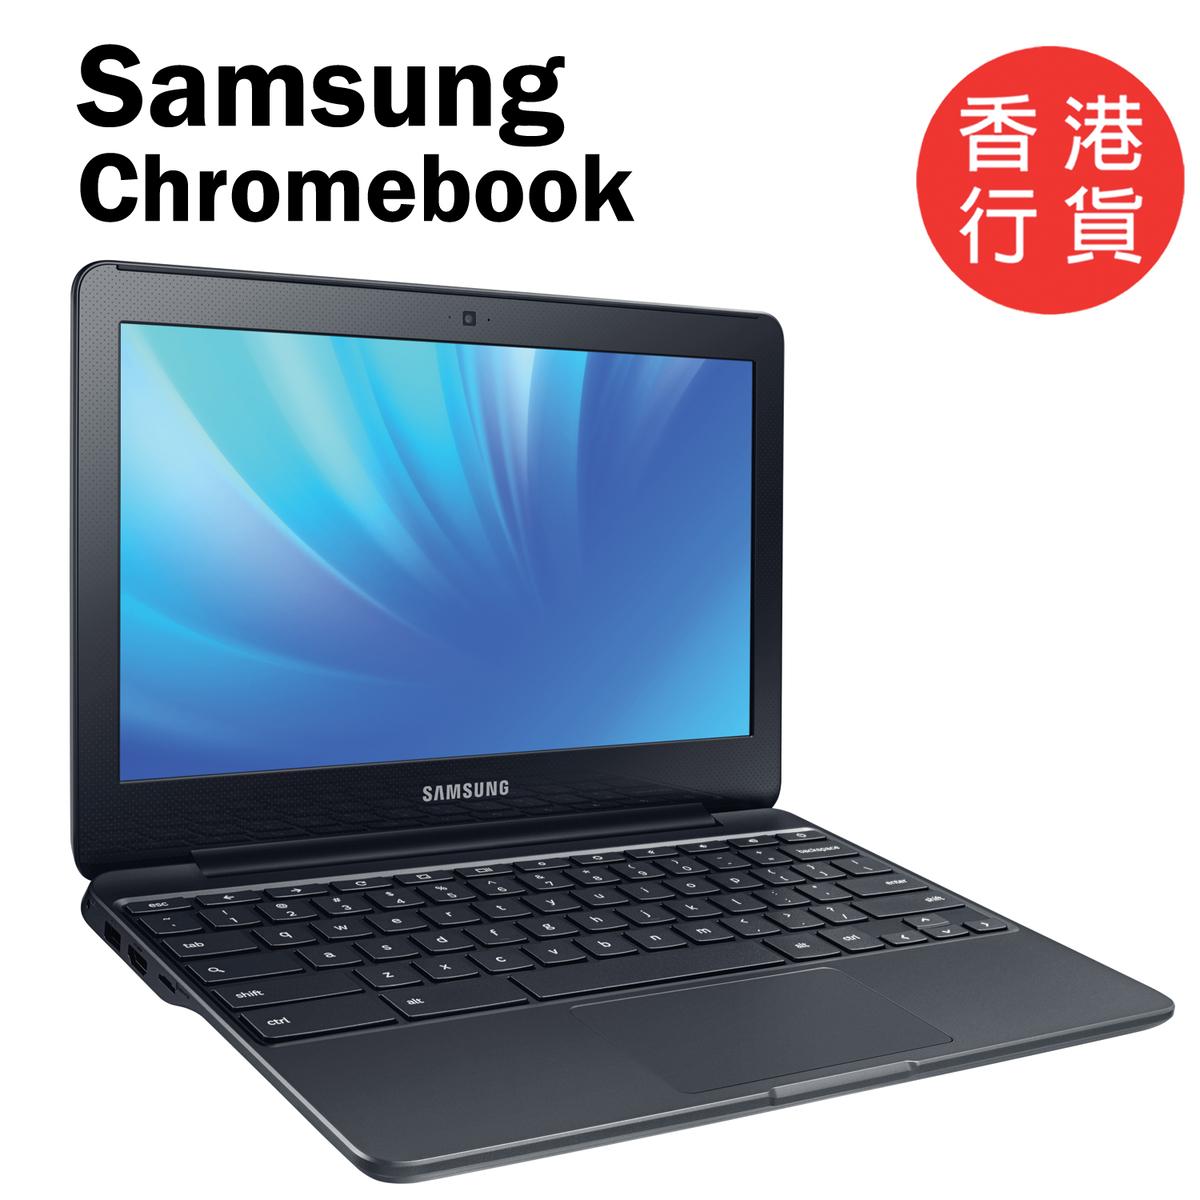 "(11.6"", N3060,4GB RAM,32GB eMMC) XE500C13-K01HK Chrome OS 筆記簿型電腦"